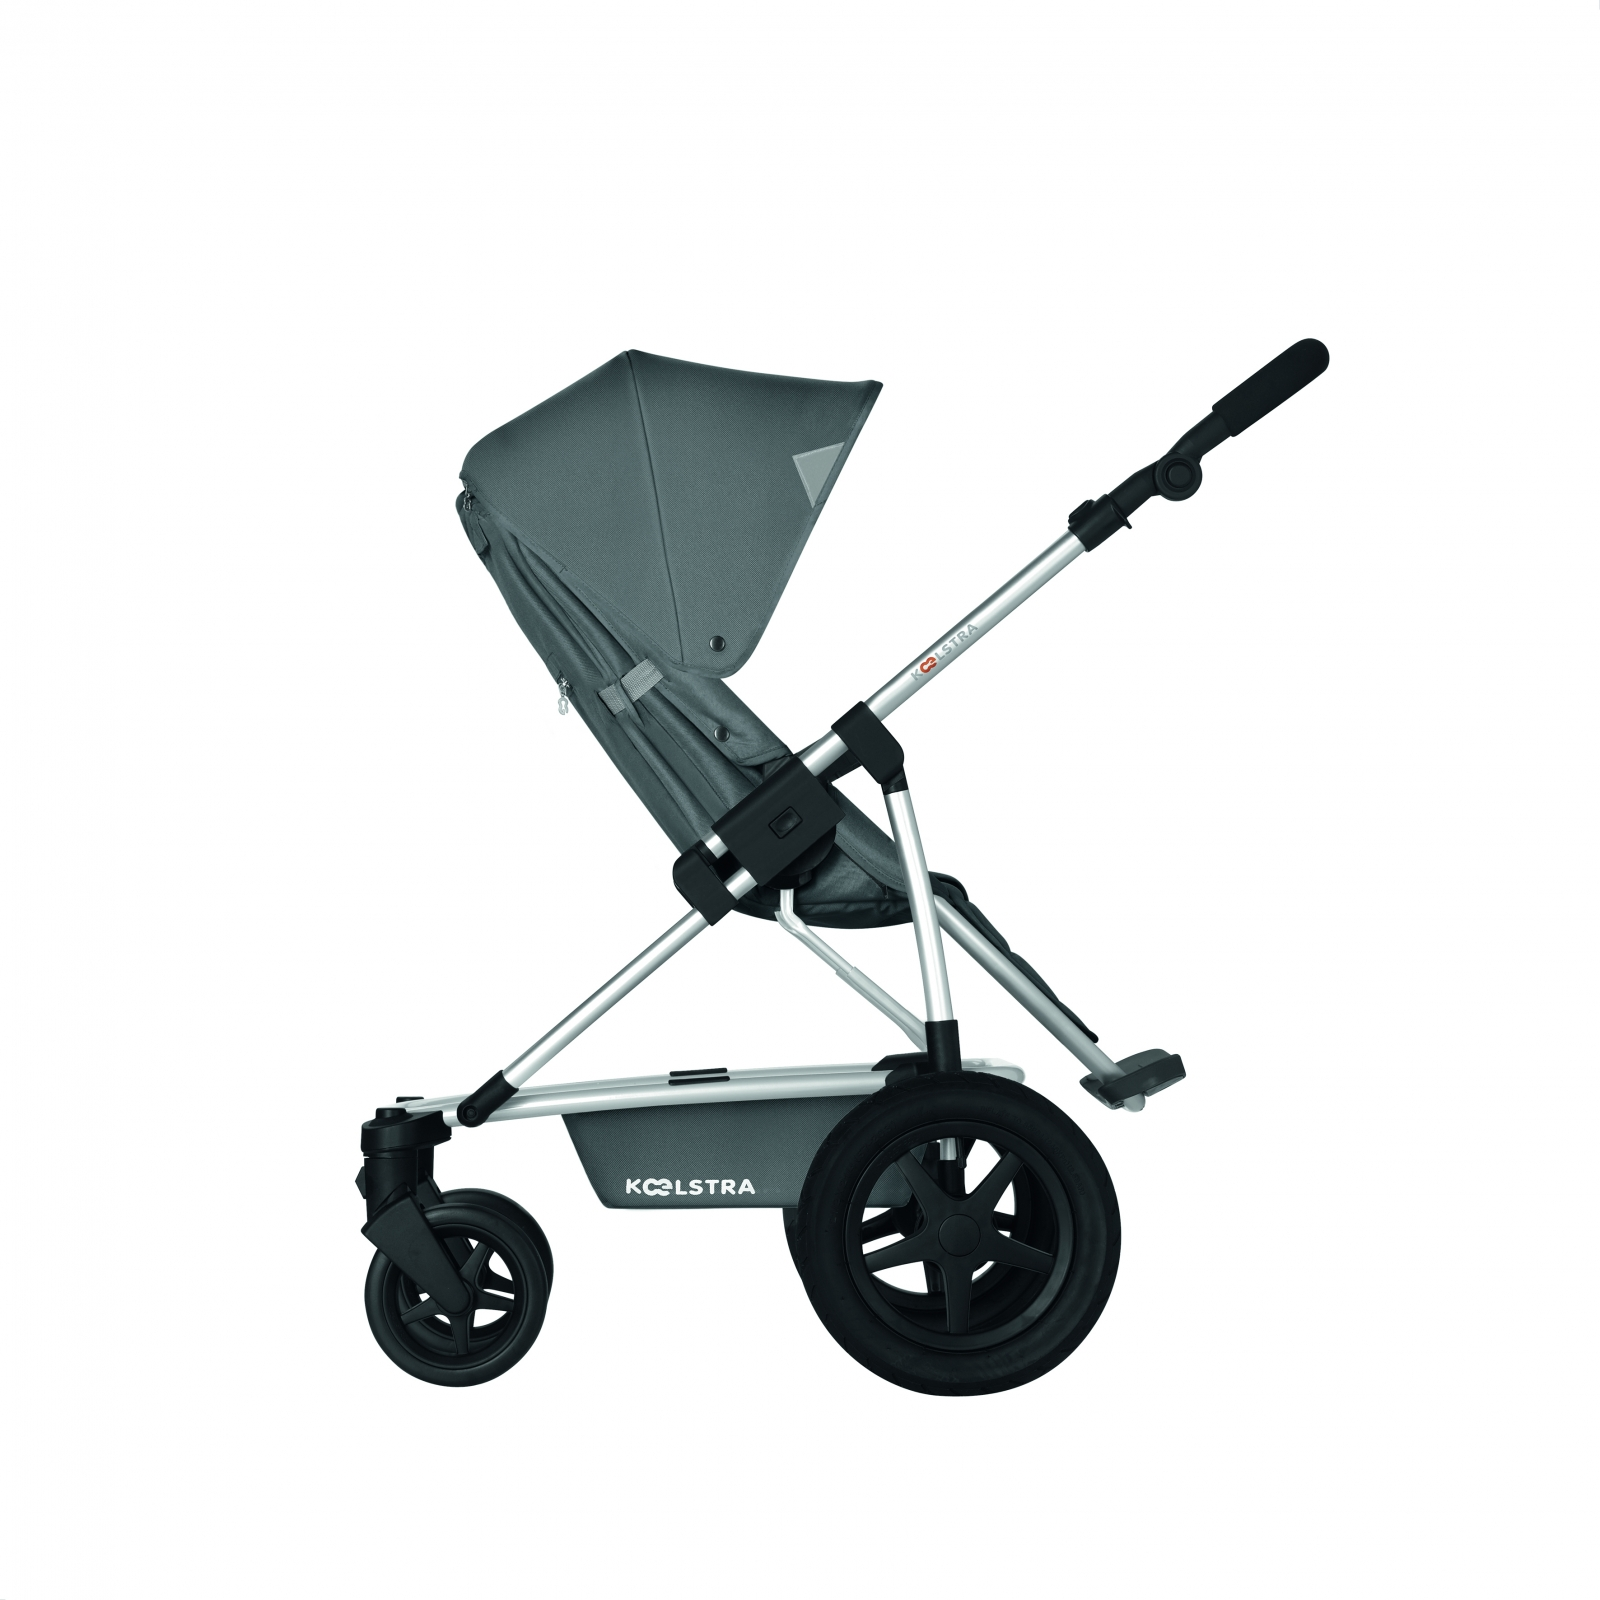 Koelstra Binque Daily Stroller